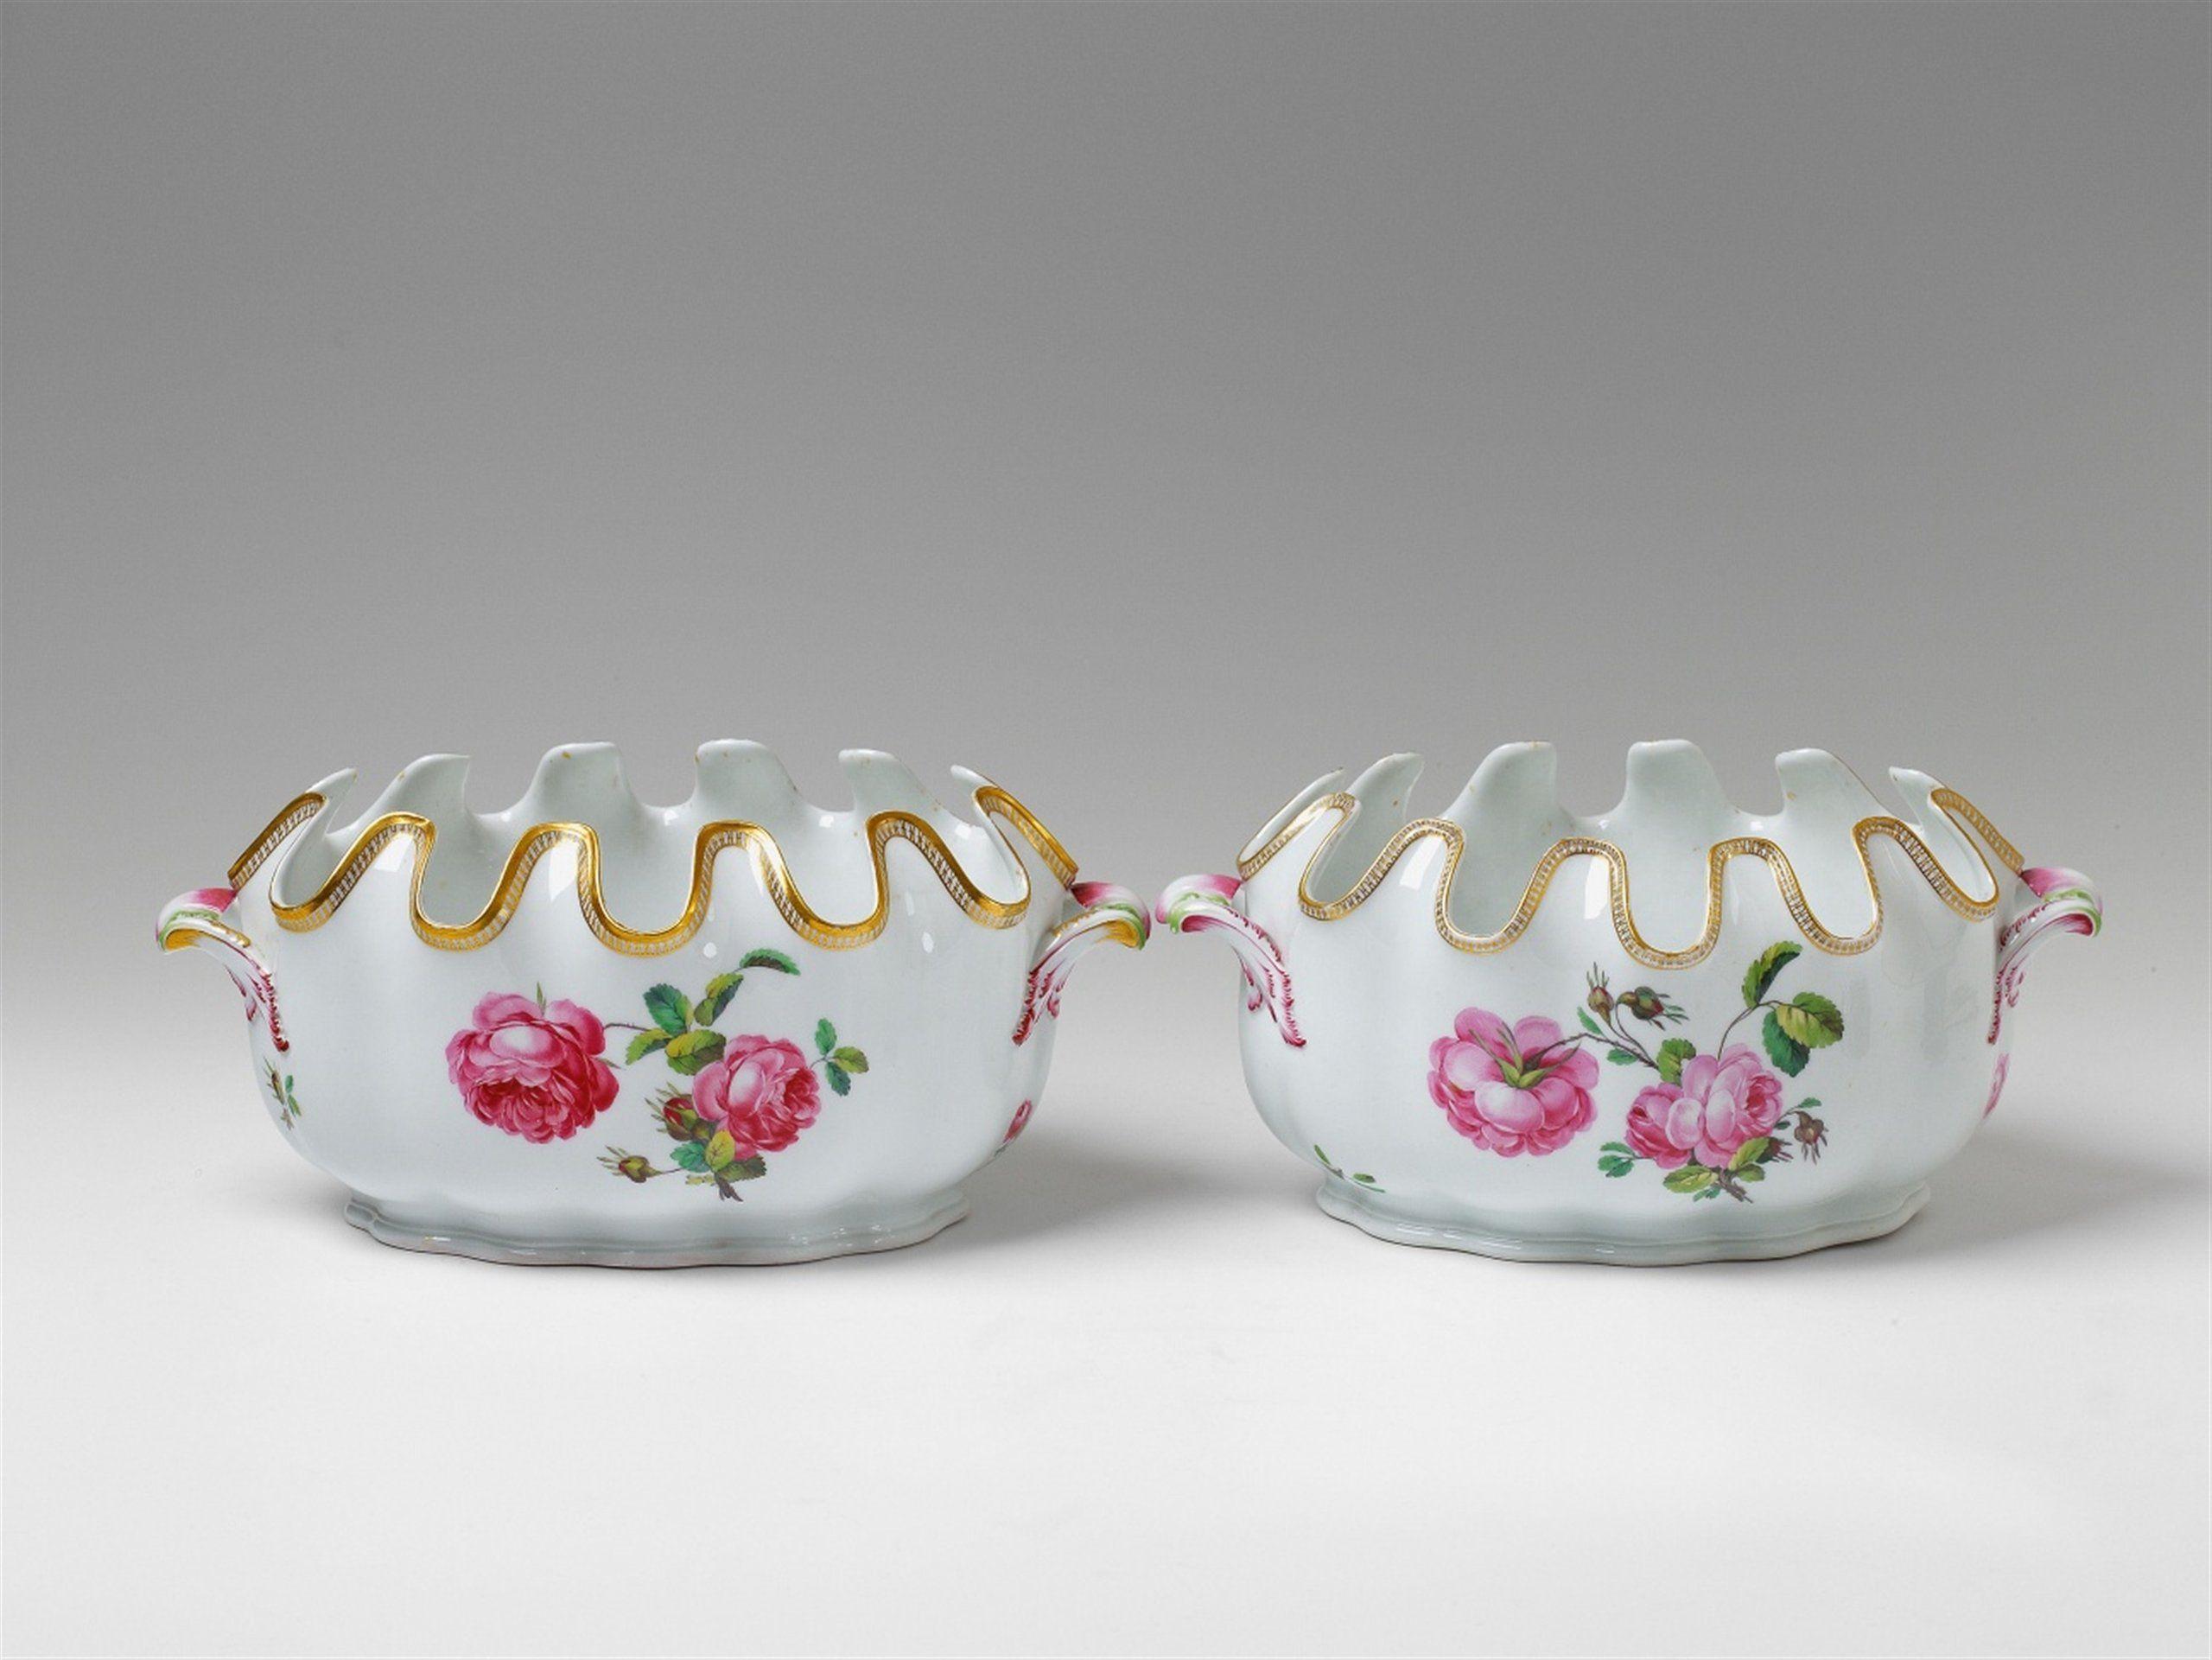 Königliche Porzellanmanufaktur Berlin, Ca. 1790.Two Berlin KPM porcelain wine coolers, Auction 1065 The Berlin Sale, Lot 39 #KPM #porcelain #porzellan